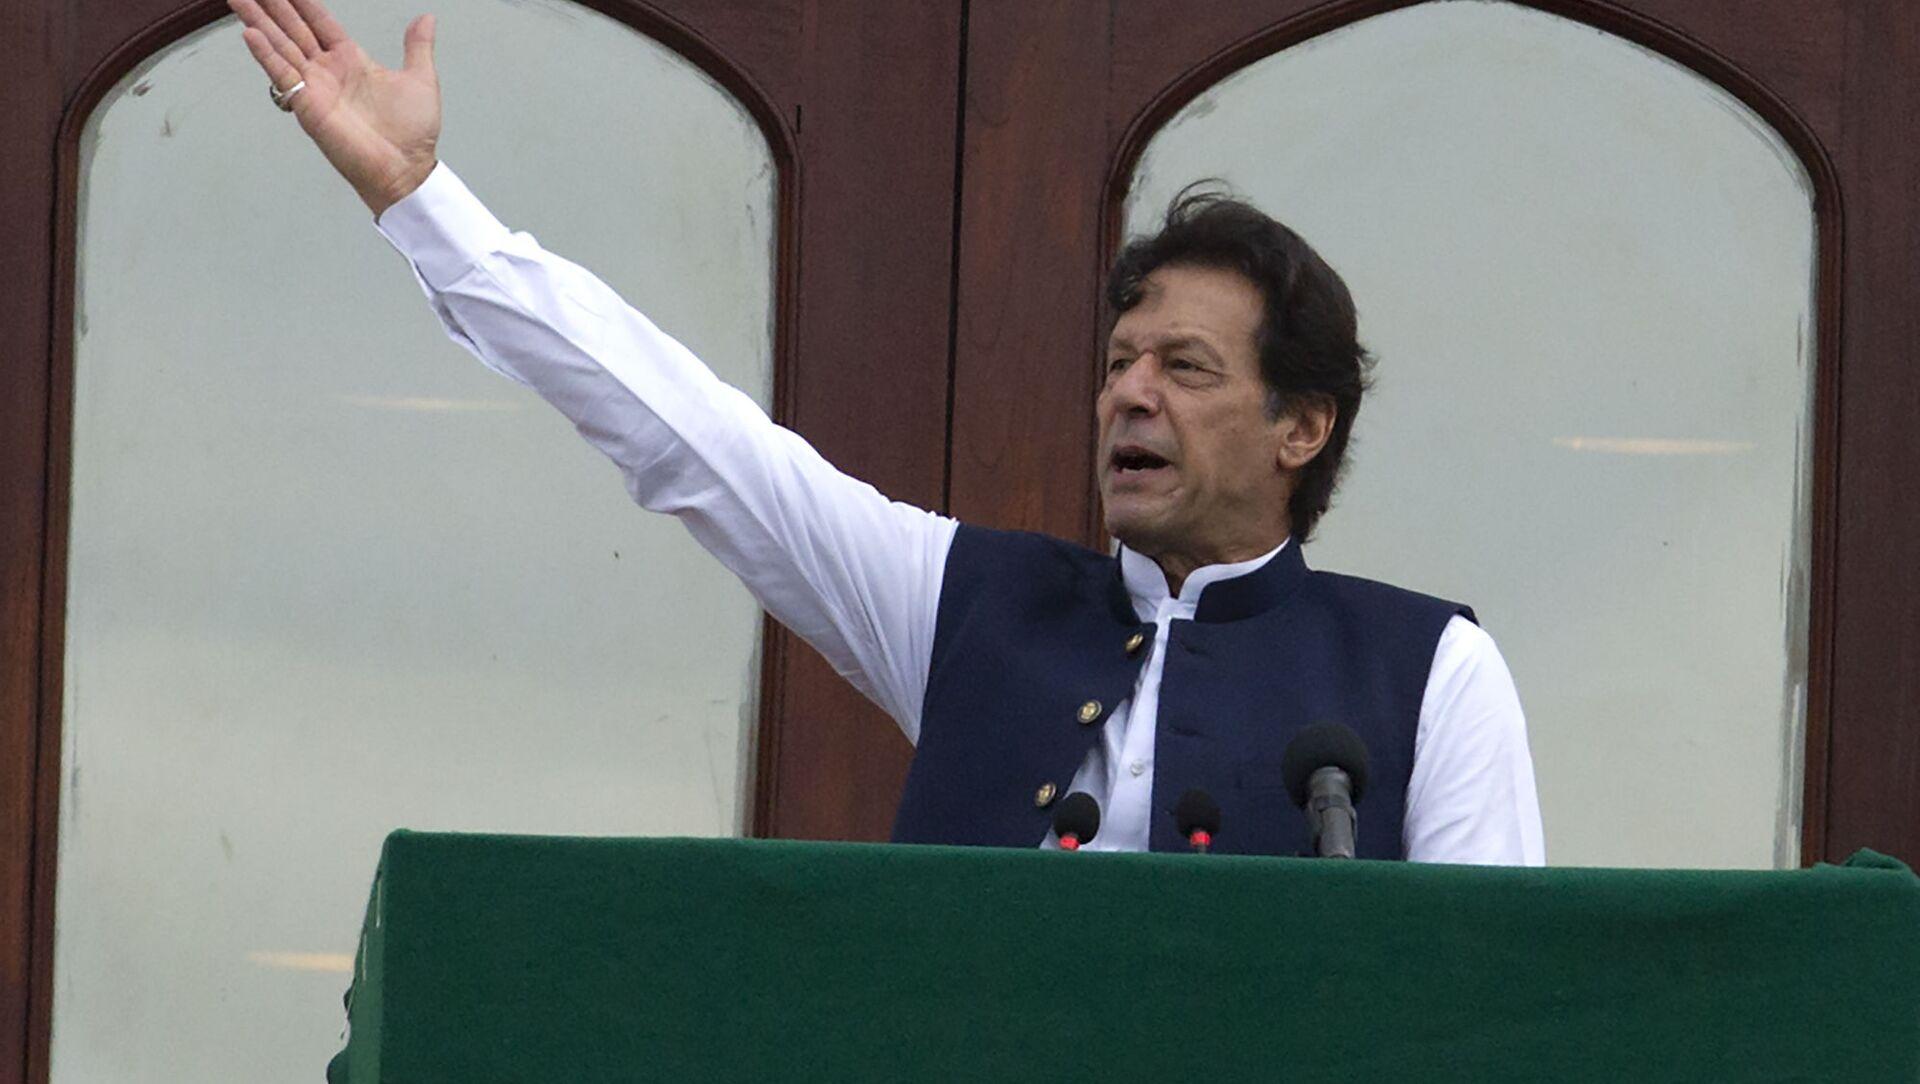 Pakistani Prime Minister Imran Khan addresses a Kashmir rally at the Prime Minister office in Islamabad, Pakistan, Friday, Aug. 30, 2019 - Sputnik International, 1920, 02.08.2021